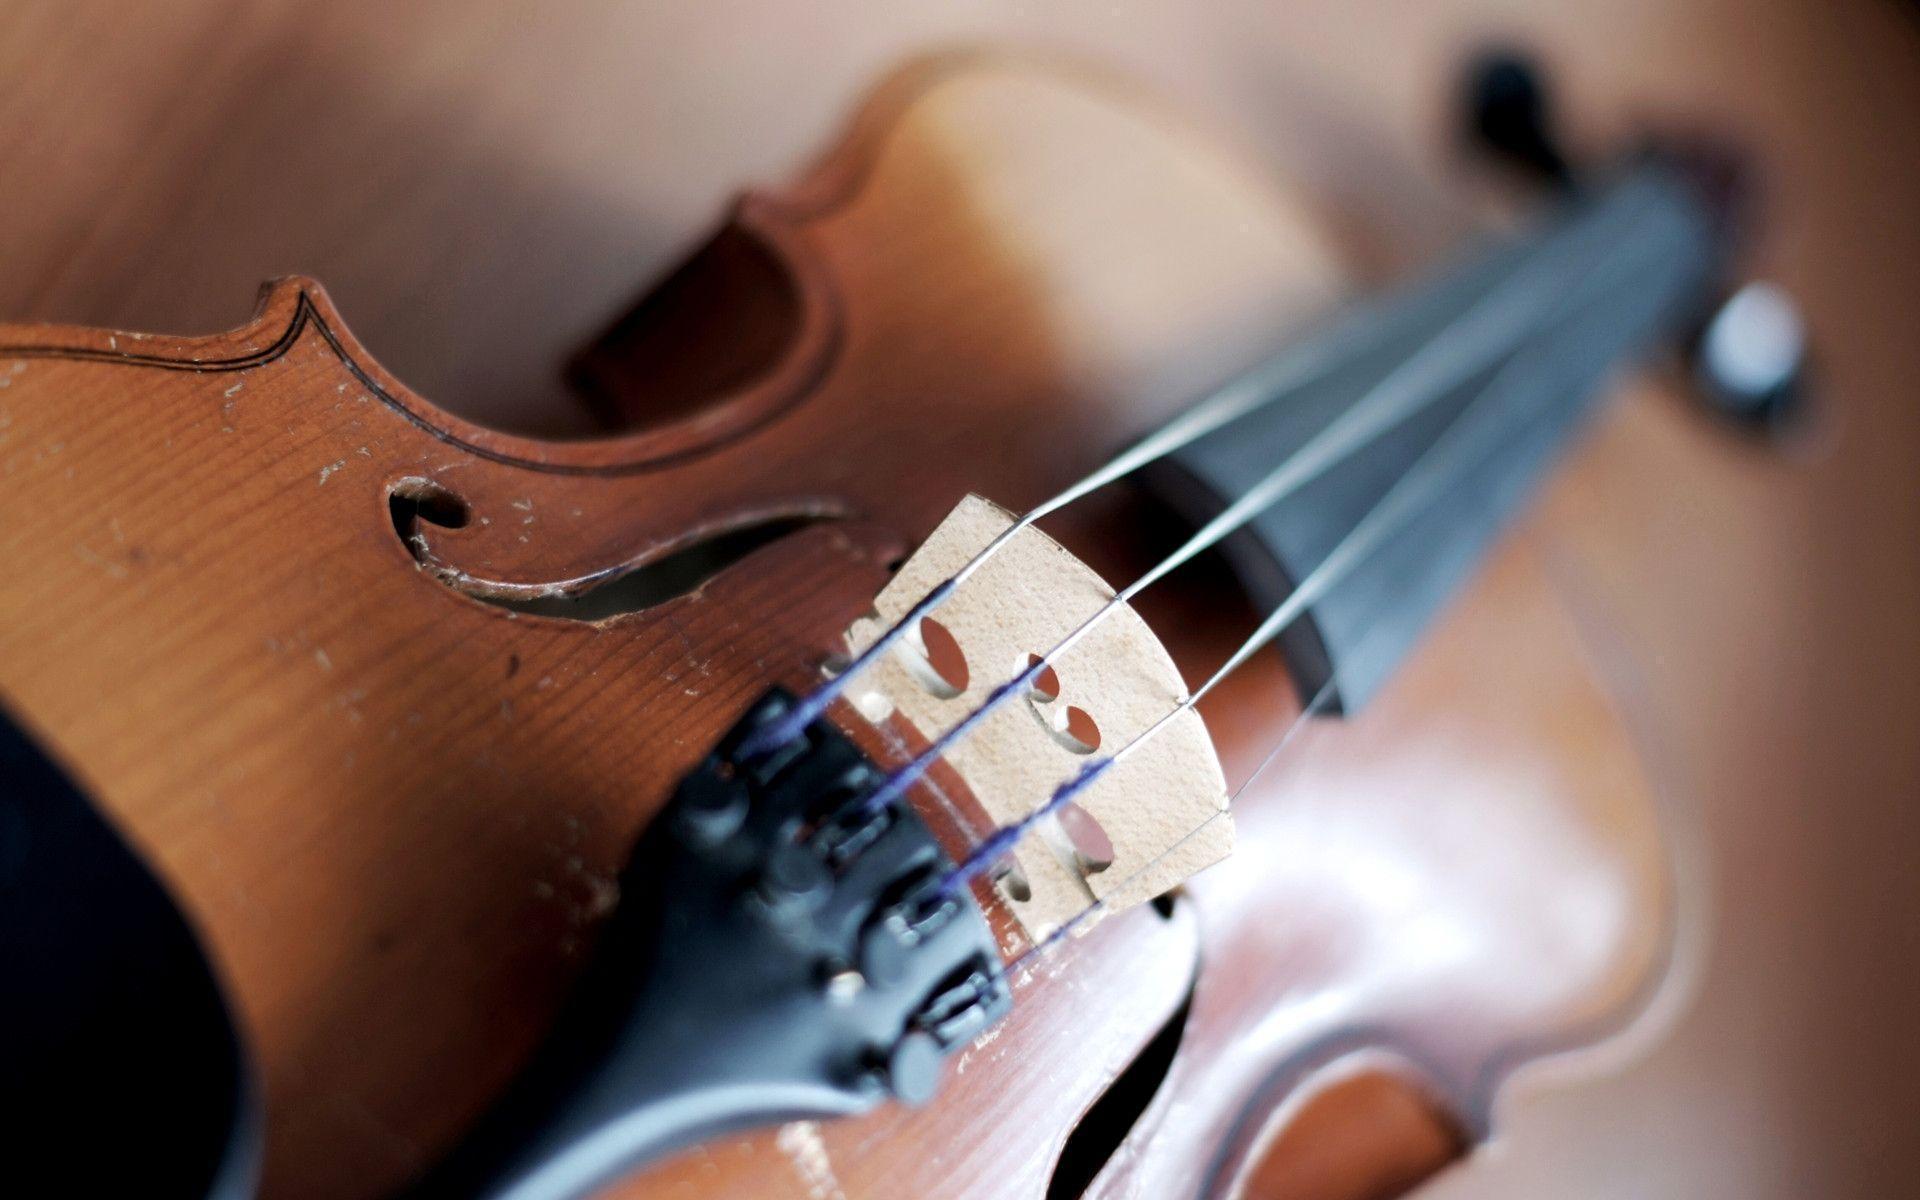 Violin Music Wallpaper | Free HD Desktop Wallpaper | Viewhdwall.